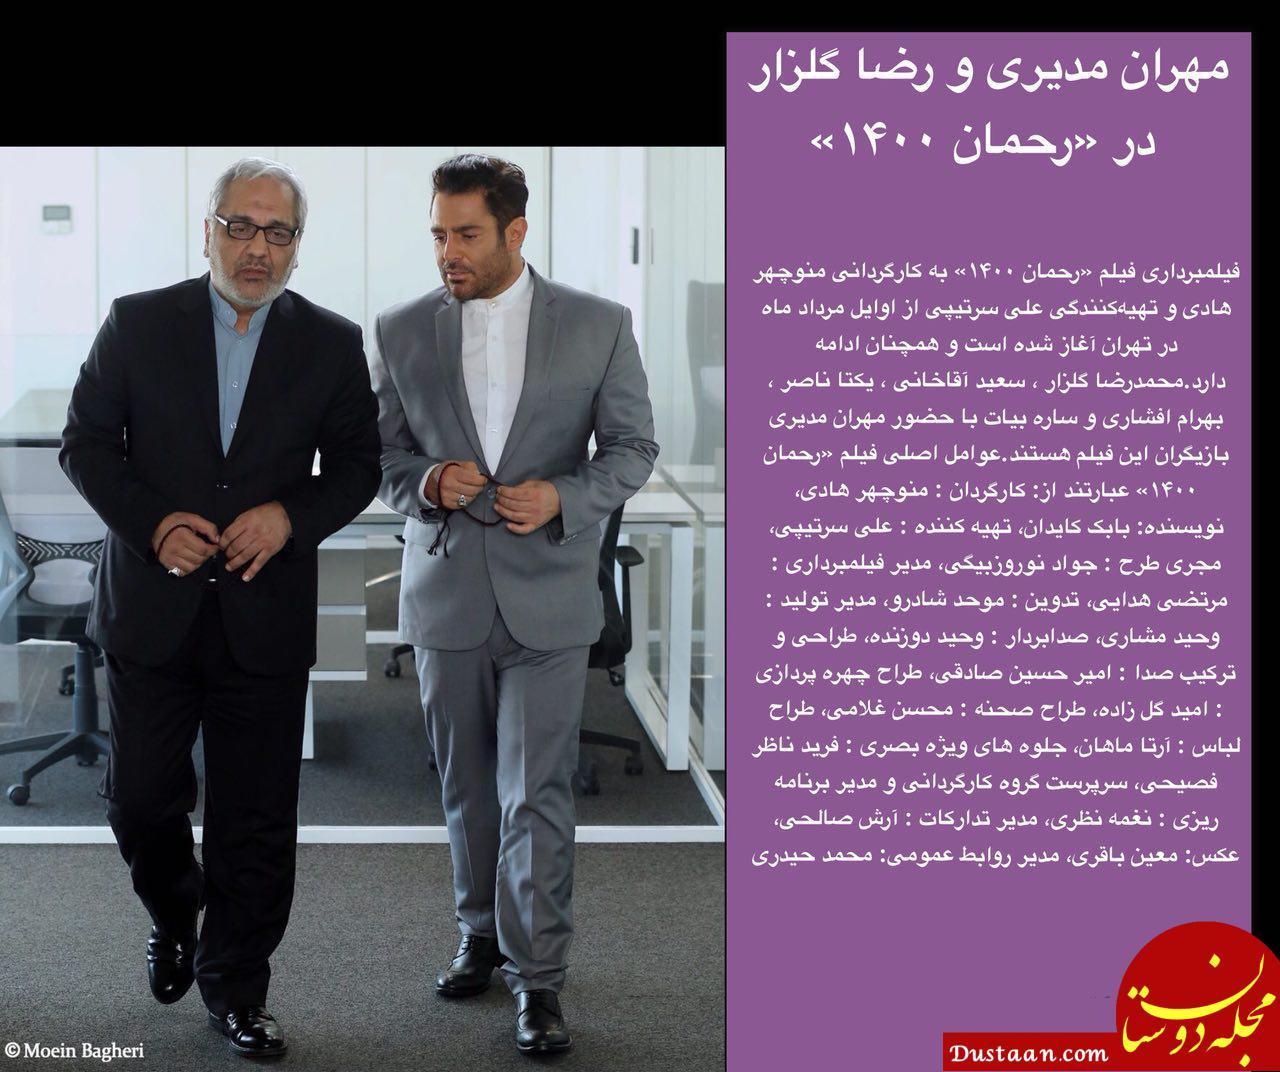 www.dustaan.com نخستین تصویر از مهران مدیری و رضا گلزار در «رحمان ۱۴۰۰»